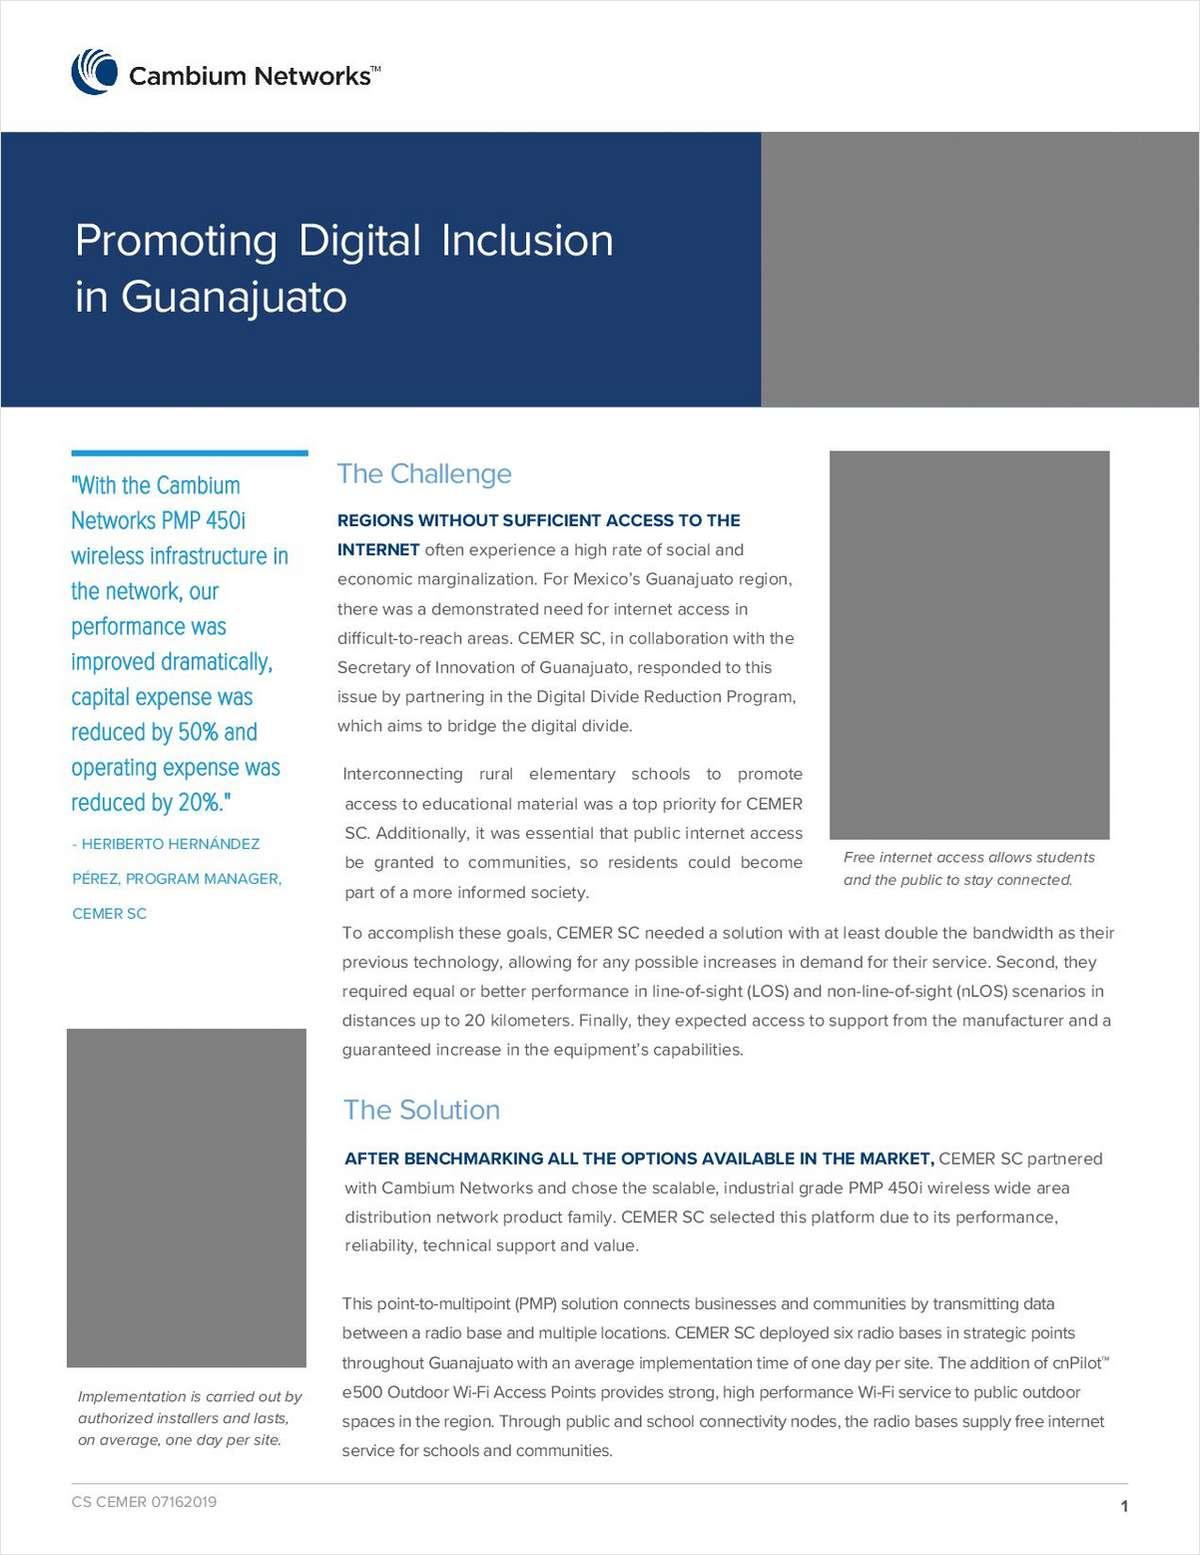 Promoting Digital Inclusion in Guanajuato